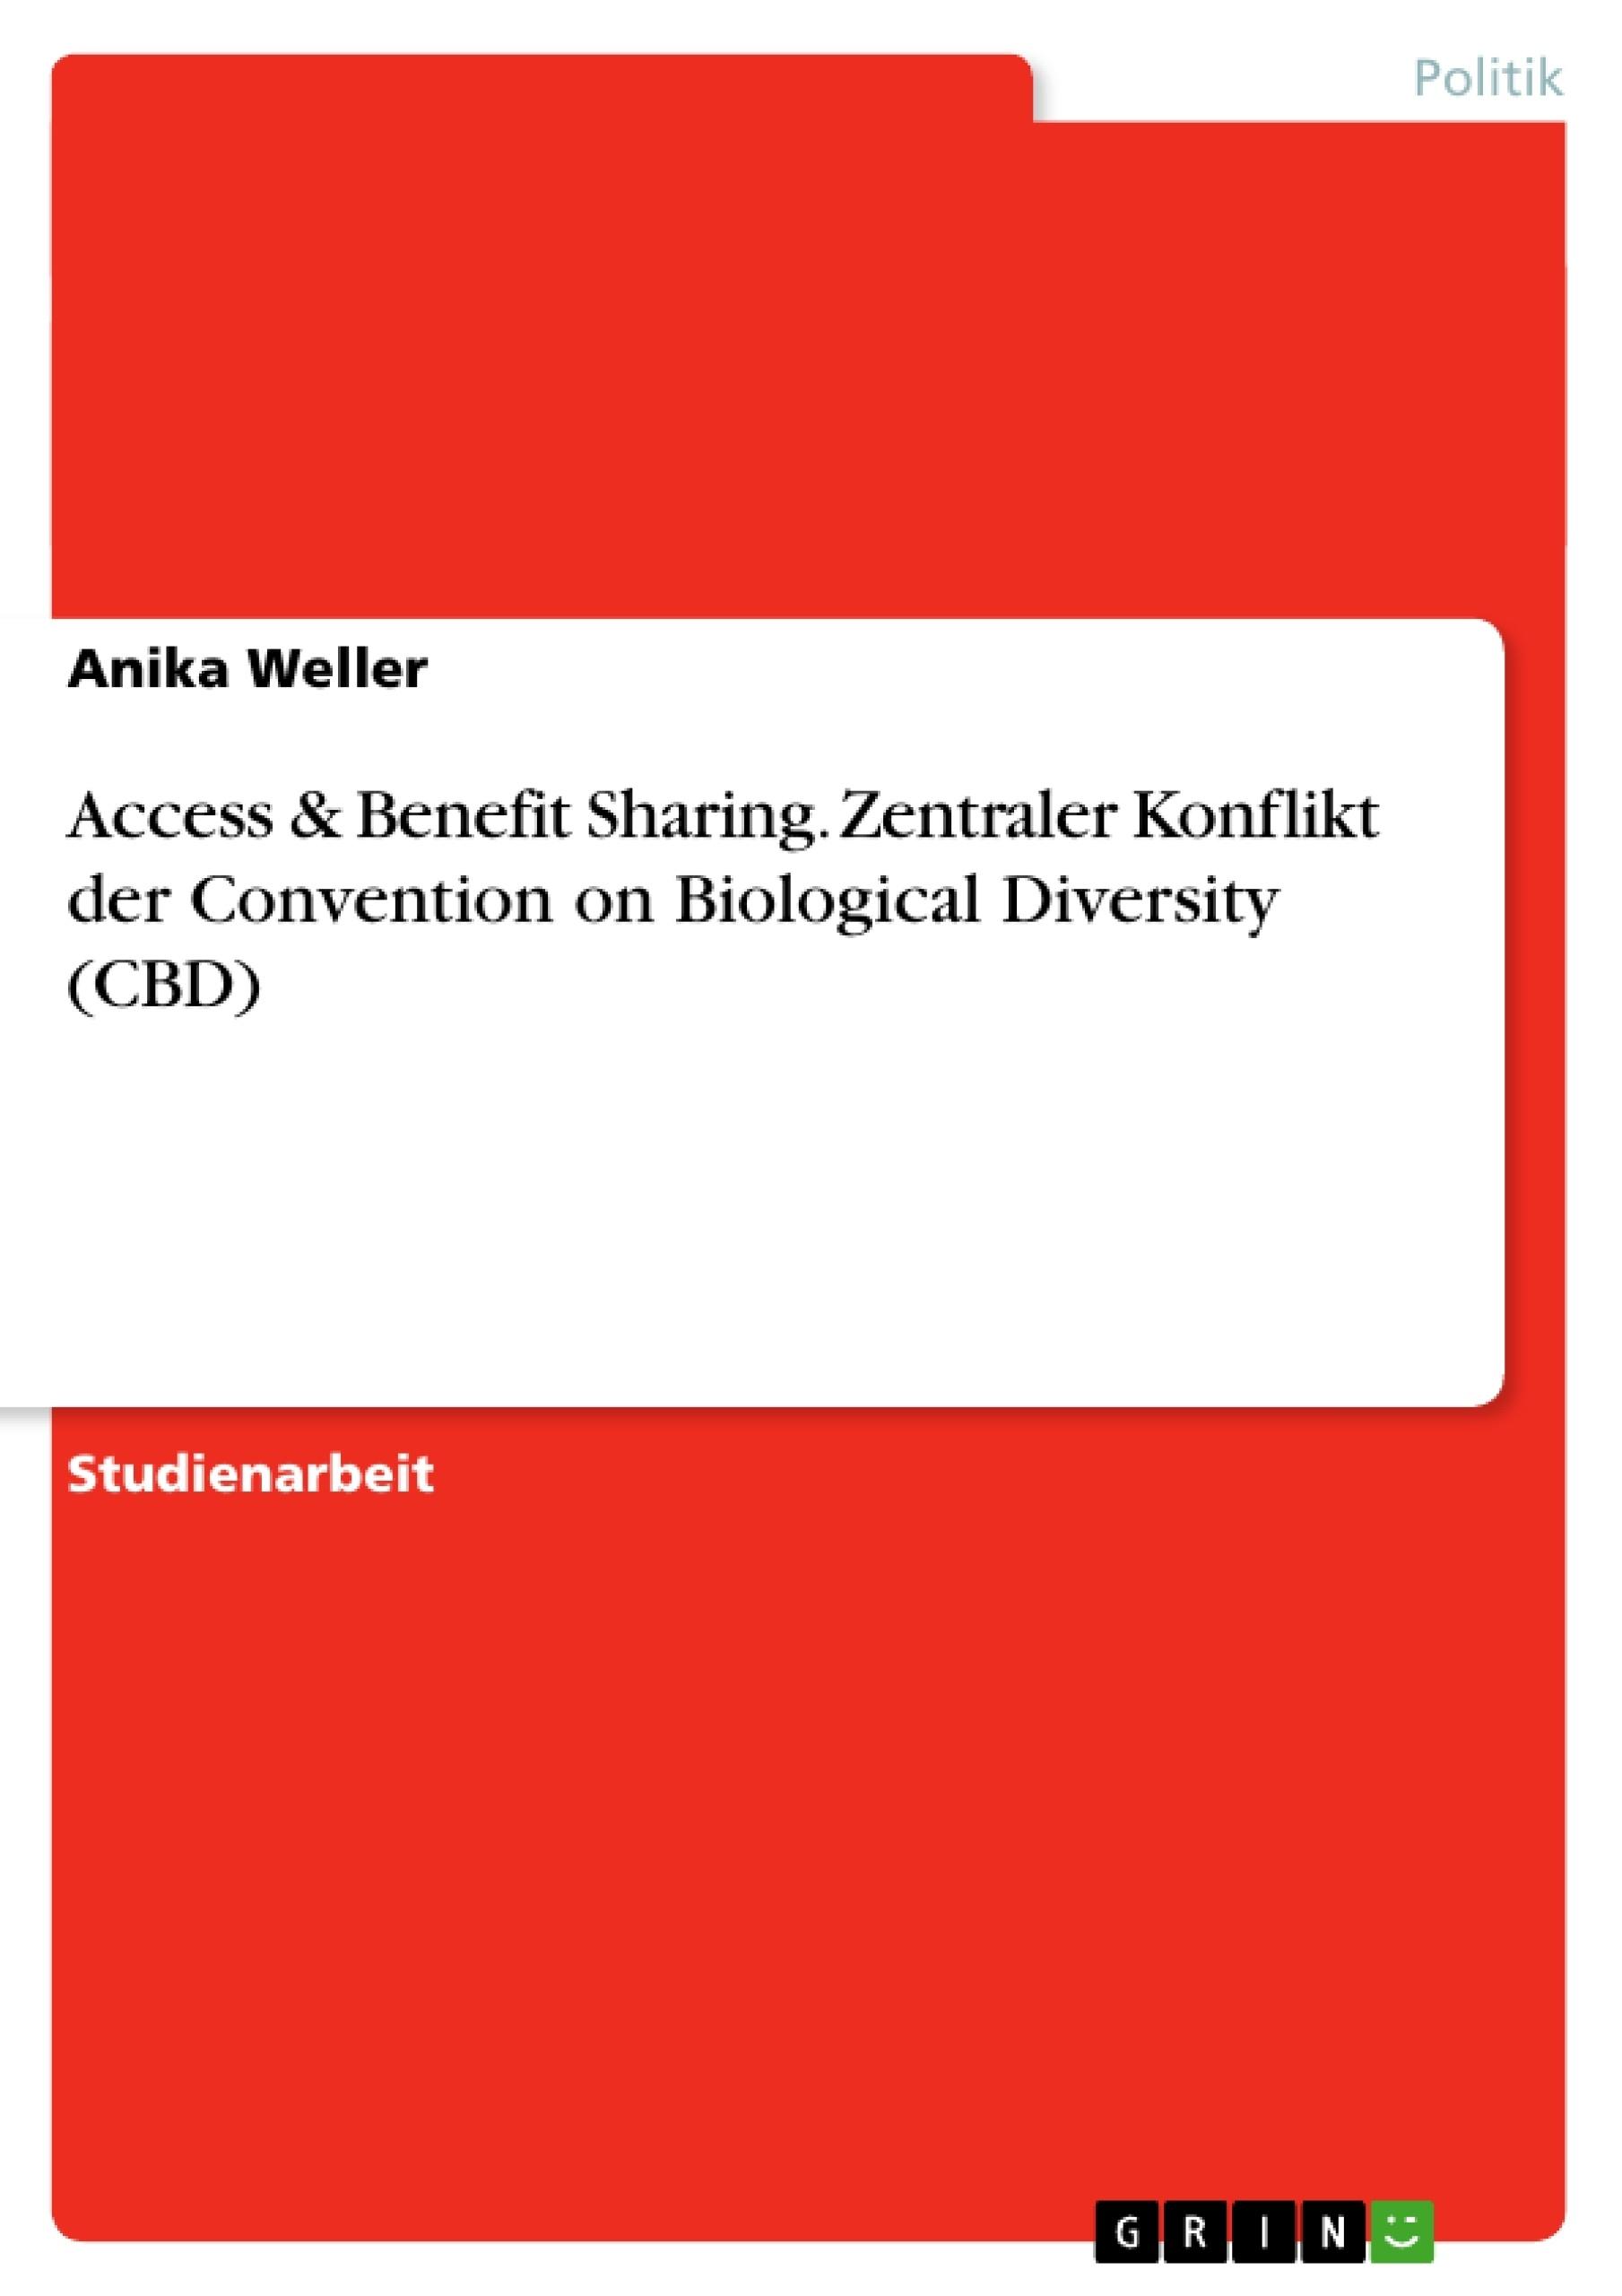 Titel: Access & Benefit Sharing. Zentraler Konflikt der Convention on Biological Diversity (CBD)